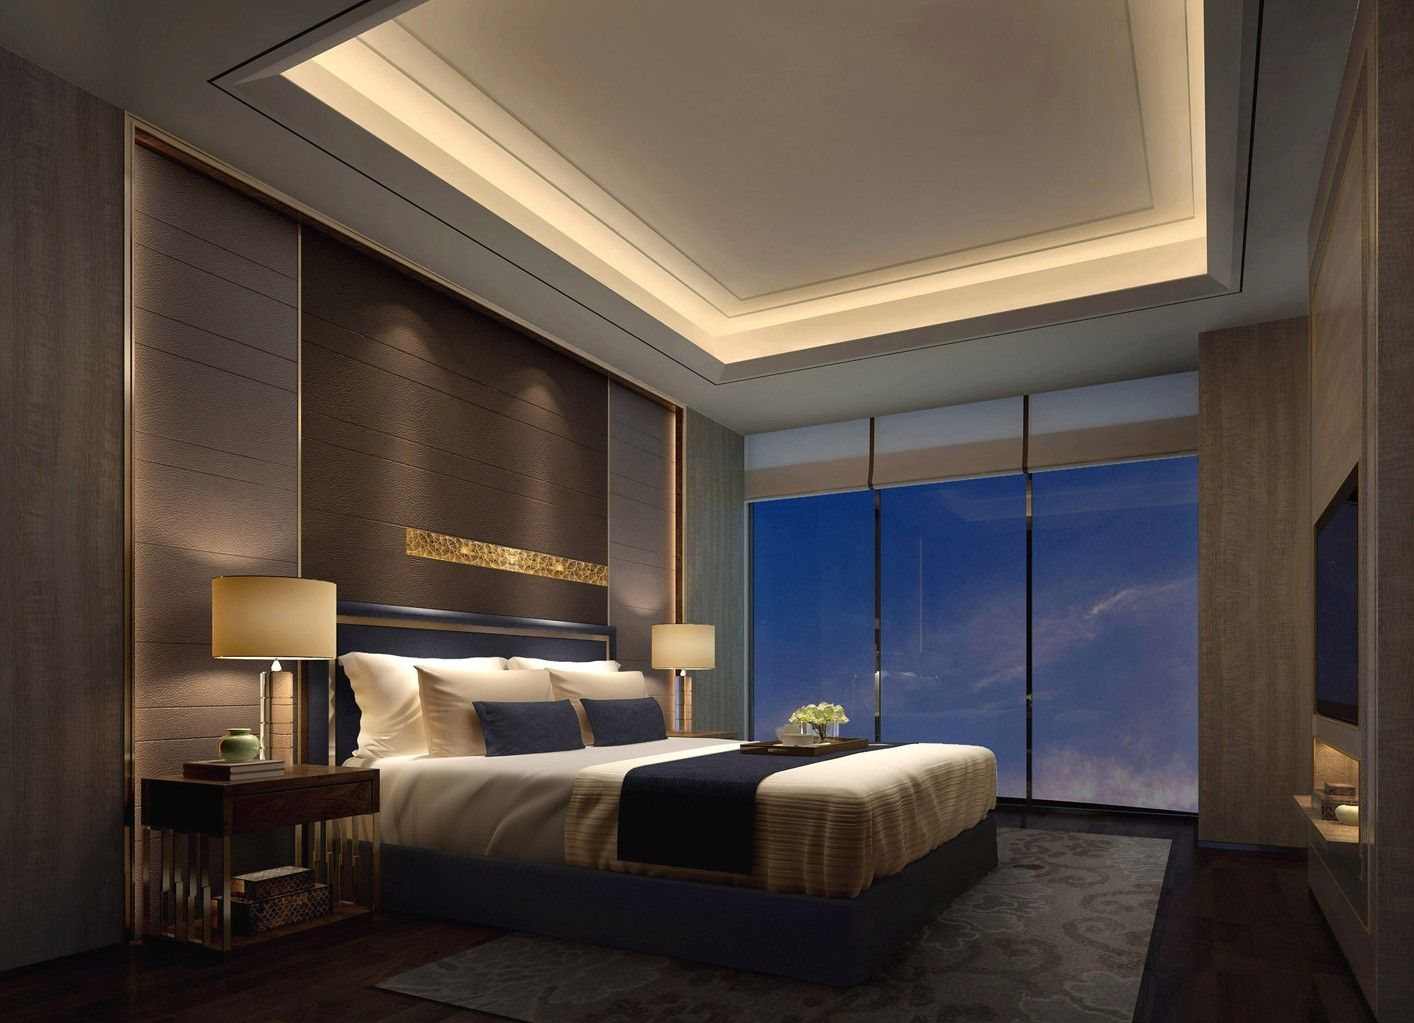 Recessed Master Bedroom Ceiling With Hidden Lights Remodel